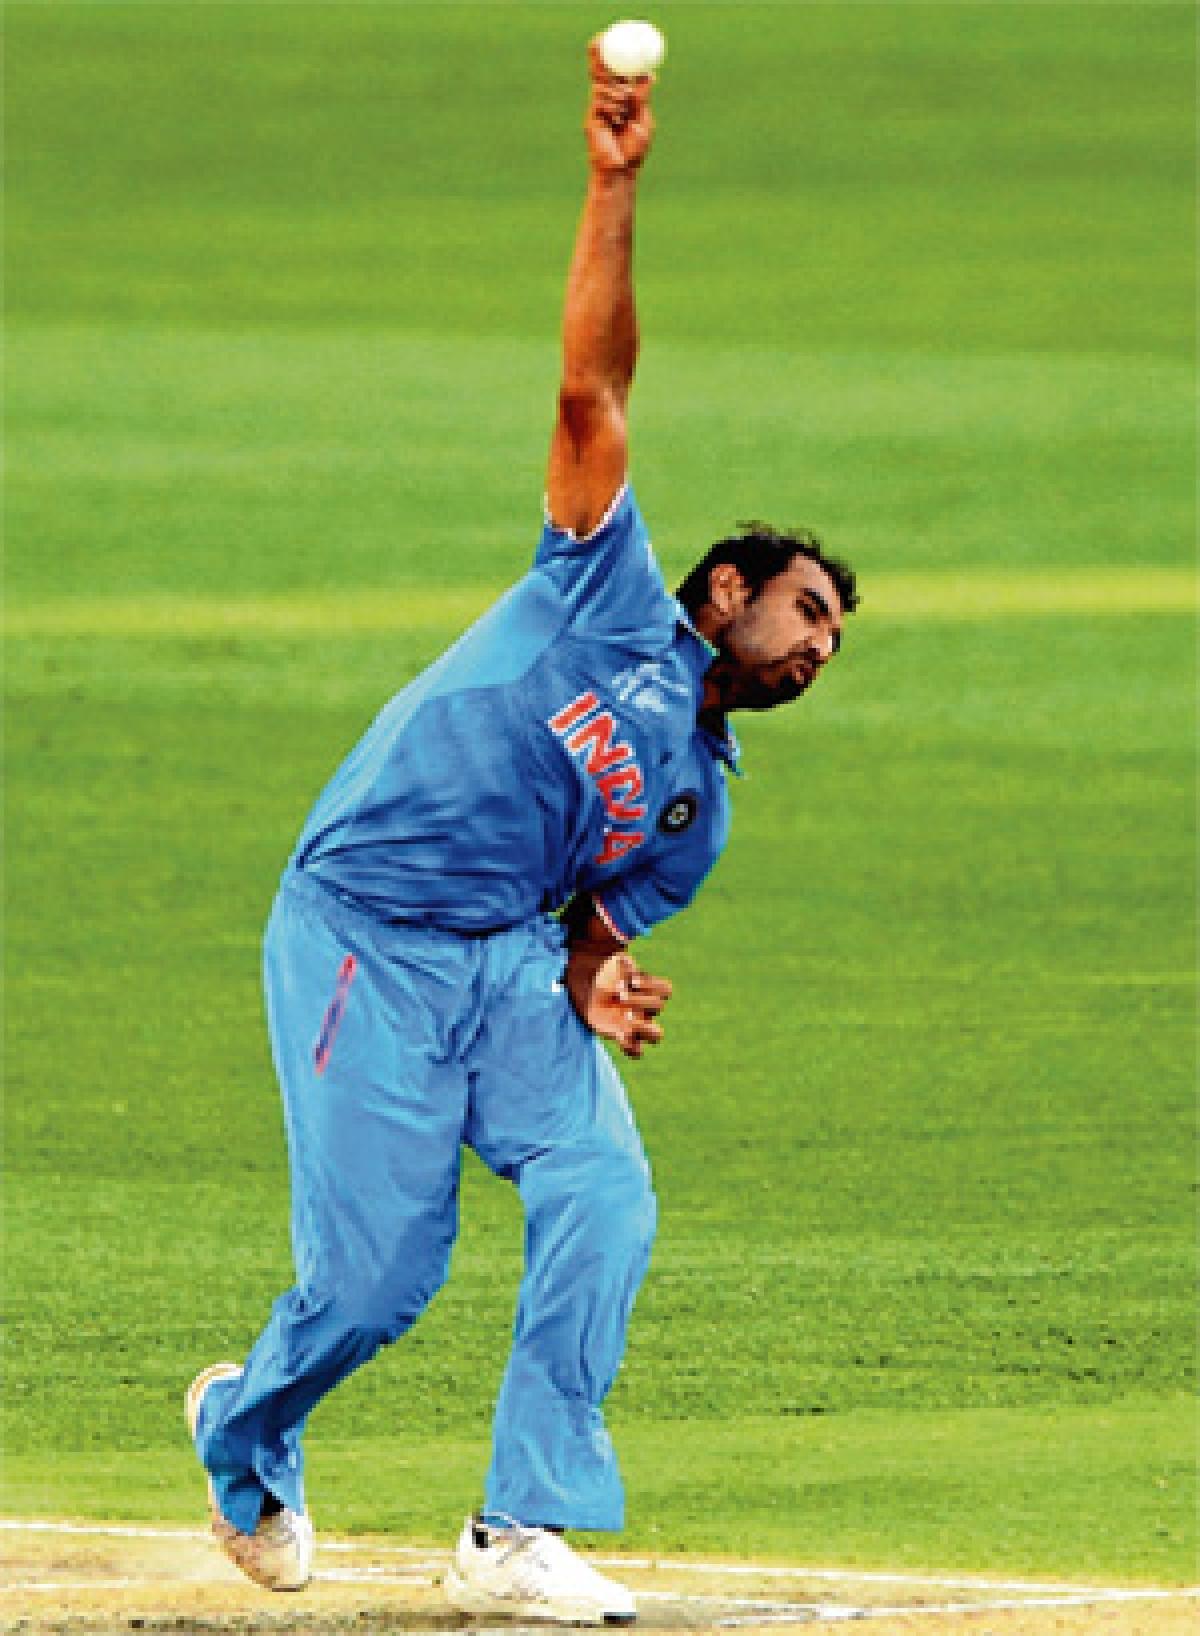 India can retain CT, pace attack has real firepower: Sangakkara